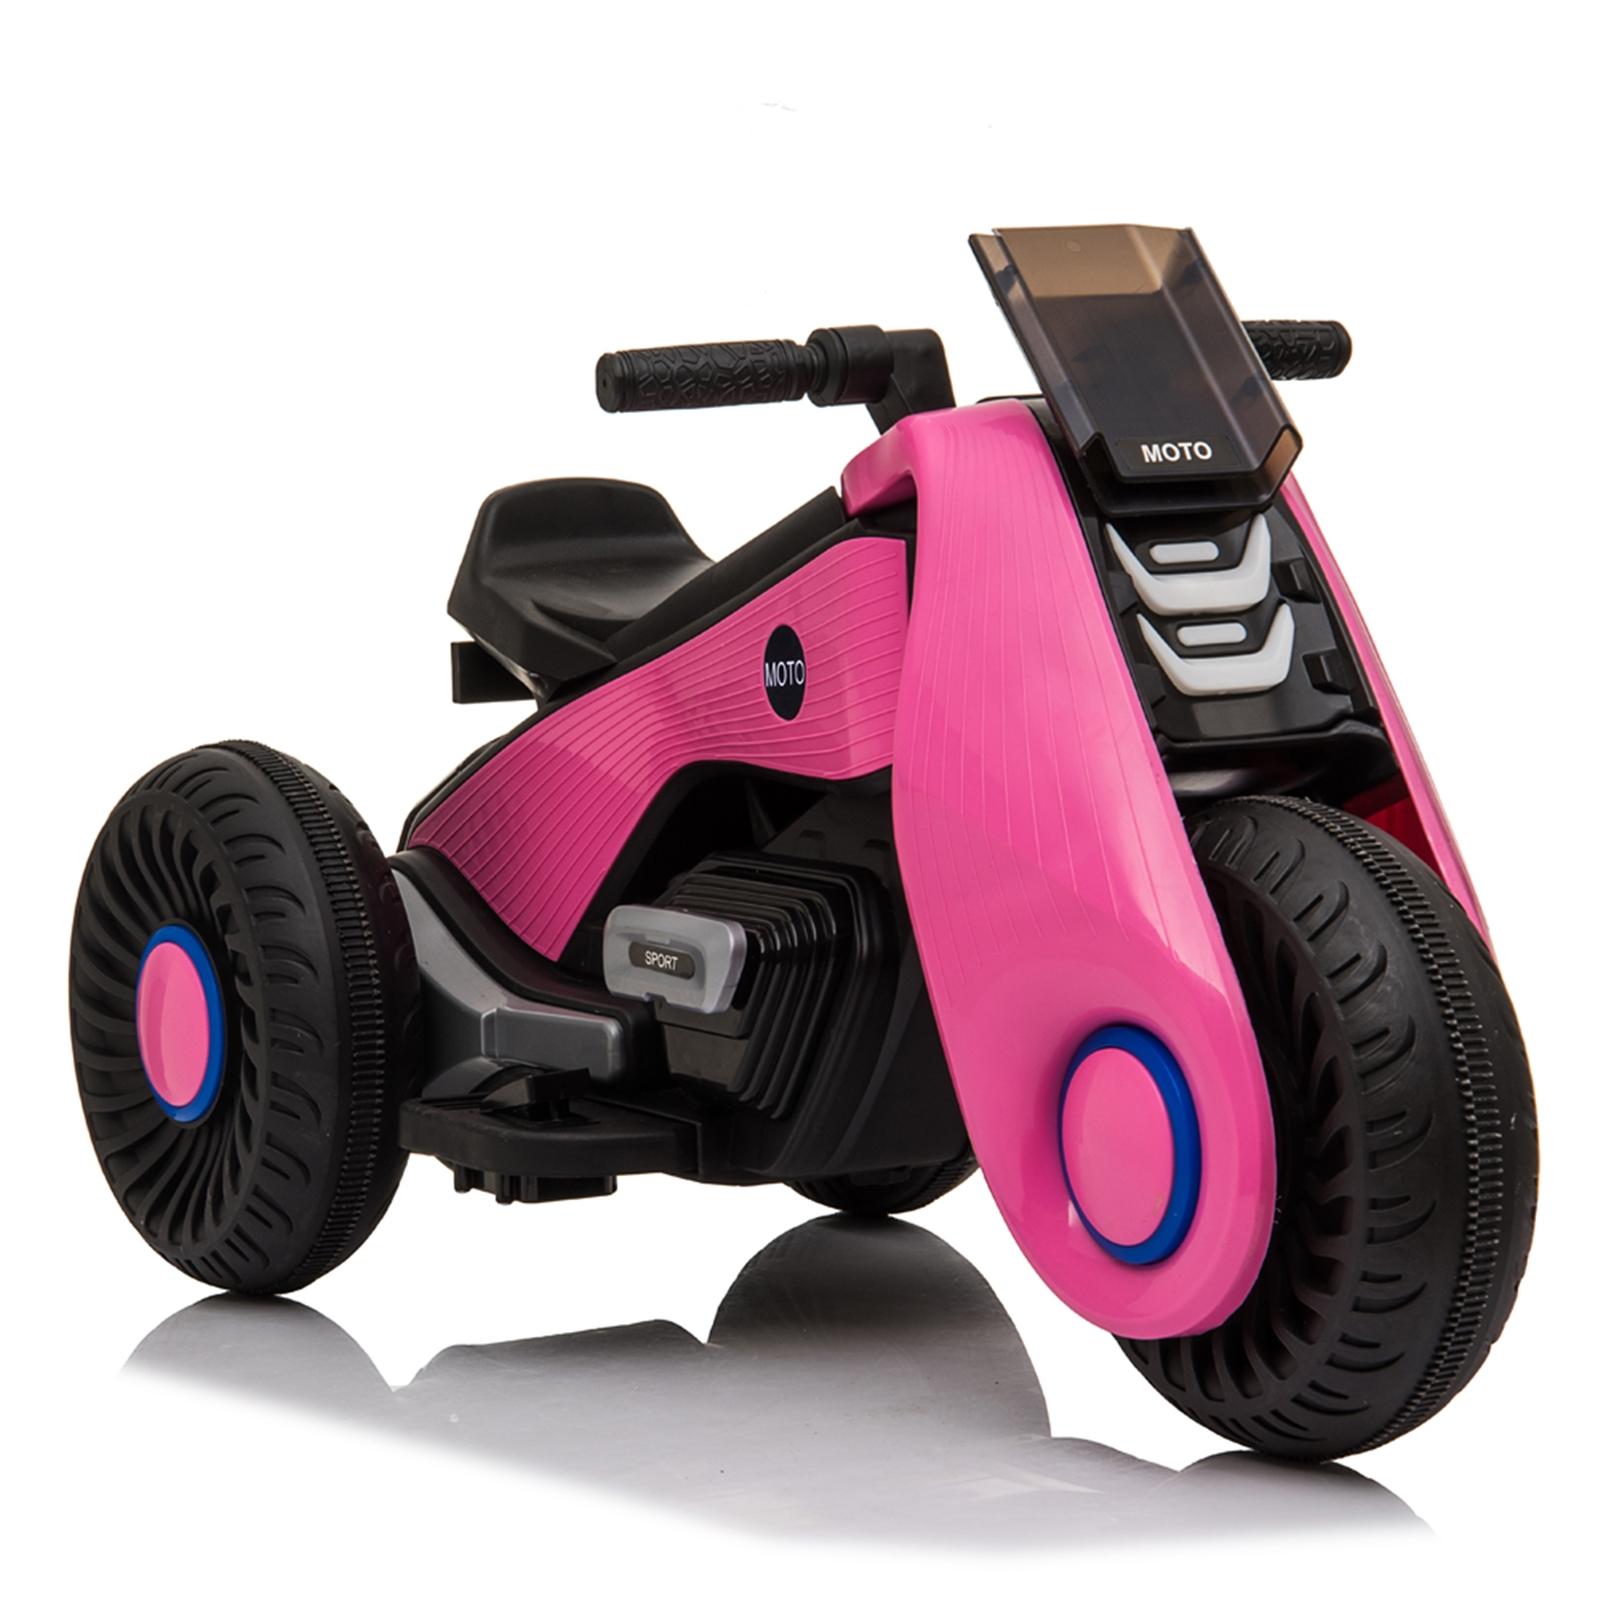 【WH】儿童电动摩托车 3轮 双驱动 粉色